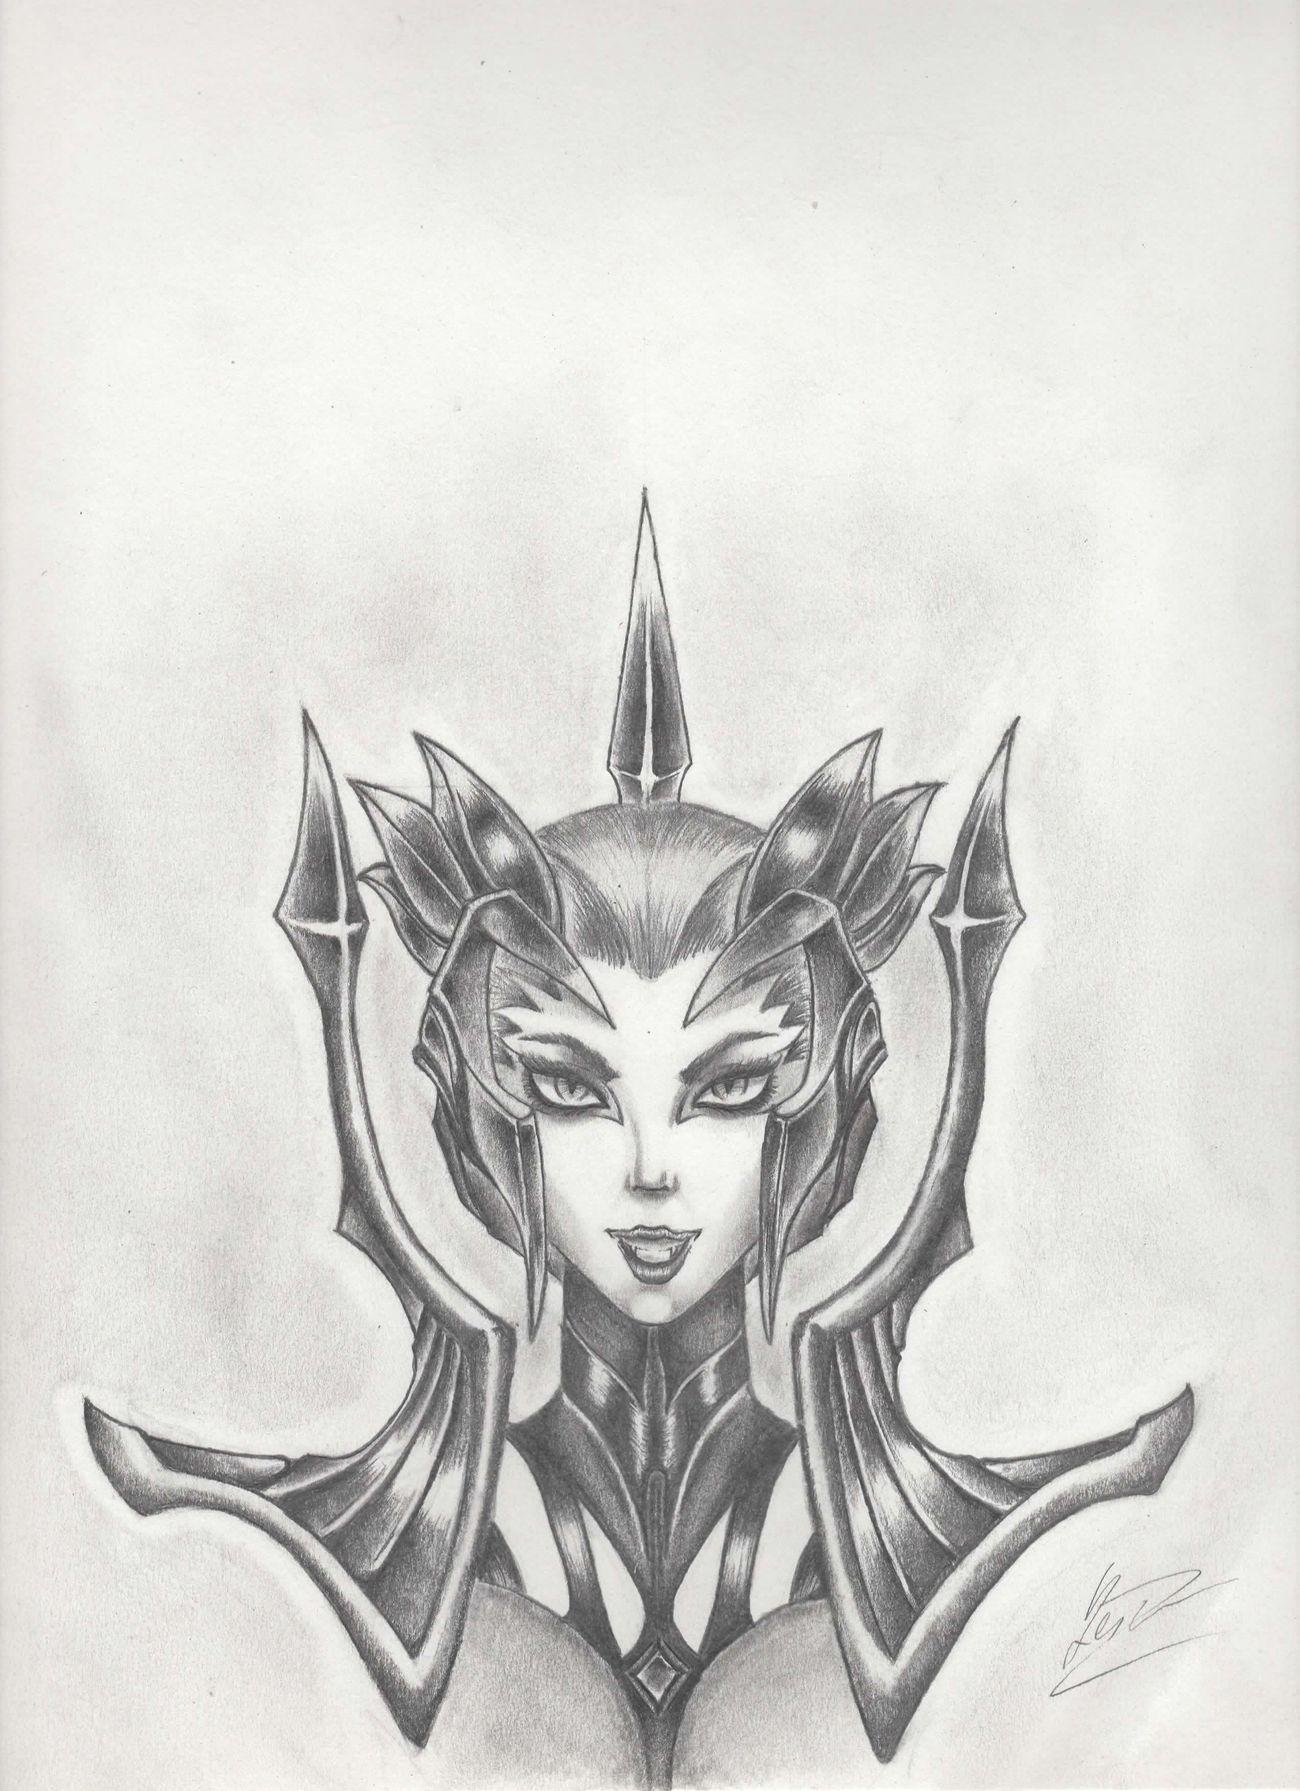 Elise from lol LeagueofLegends League Of Legends Art Drawing Pencil Drawing Fanart Fan Art Black And White Portrait Drawing ✏ Draw